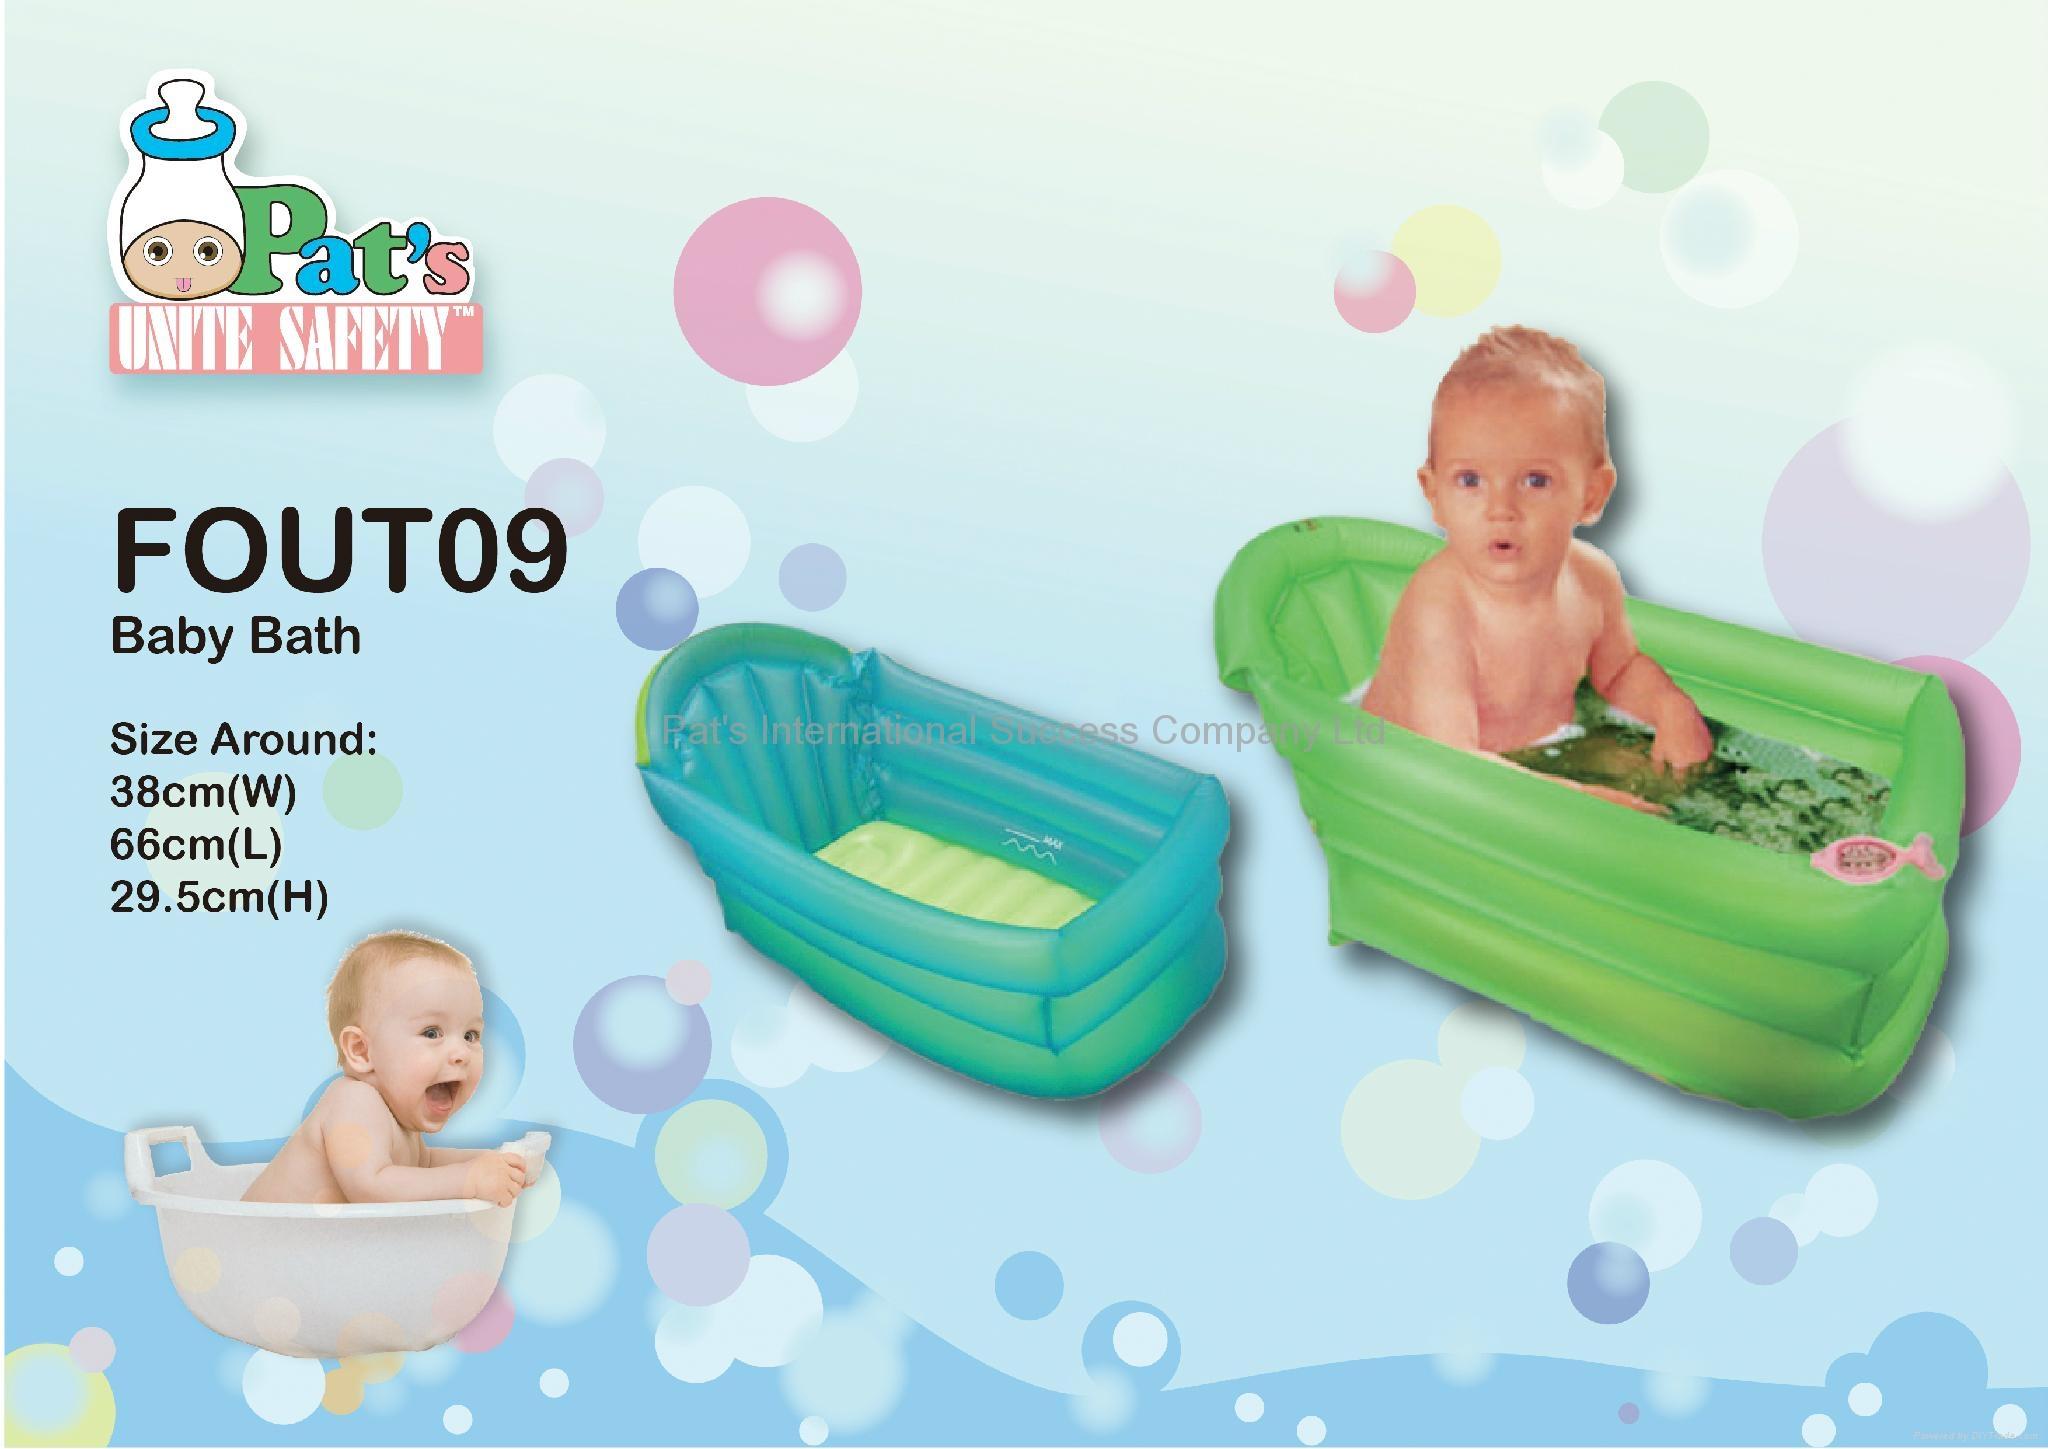 portable bath tub hong kong manufacturer baby care pat 39 s. Black Bedroom Furniture Sets. Home Design Ideas